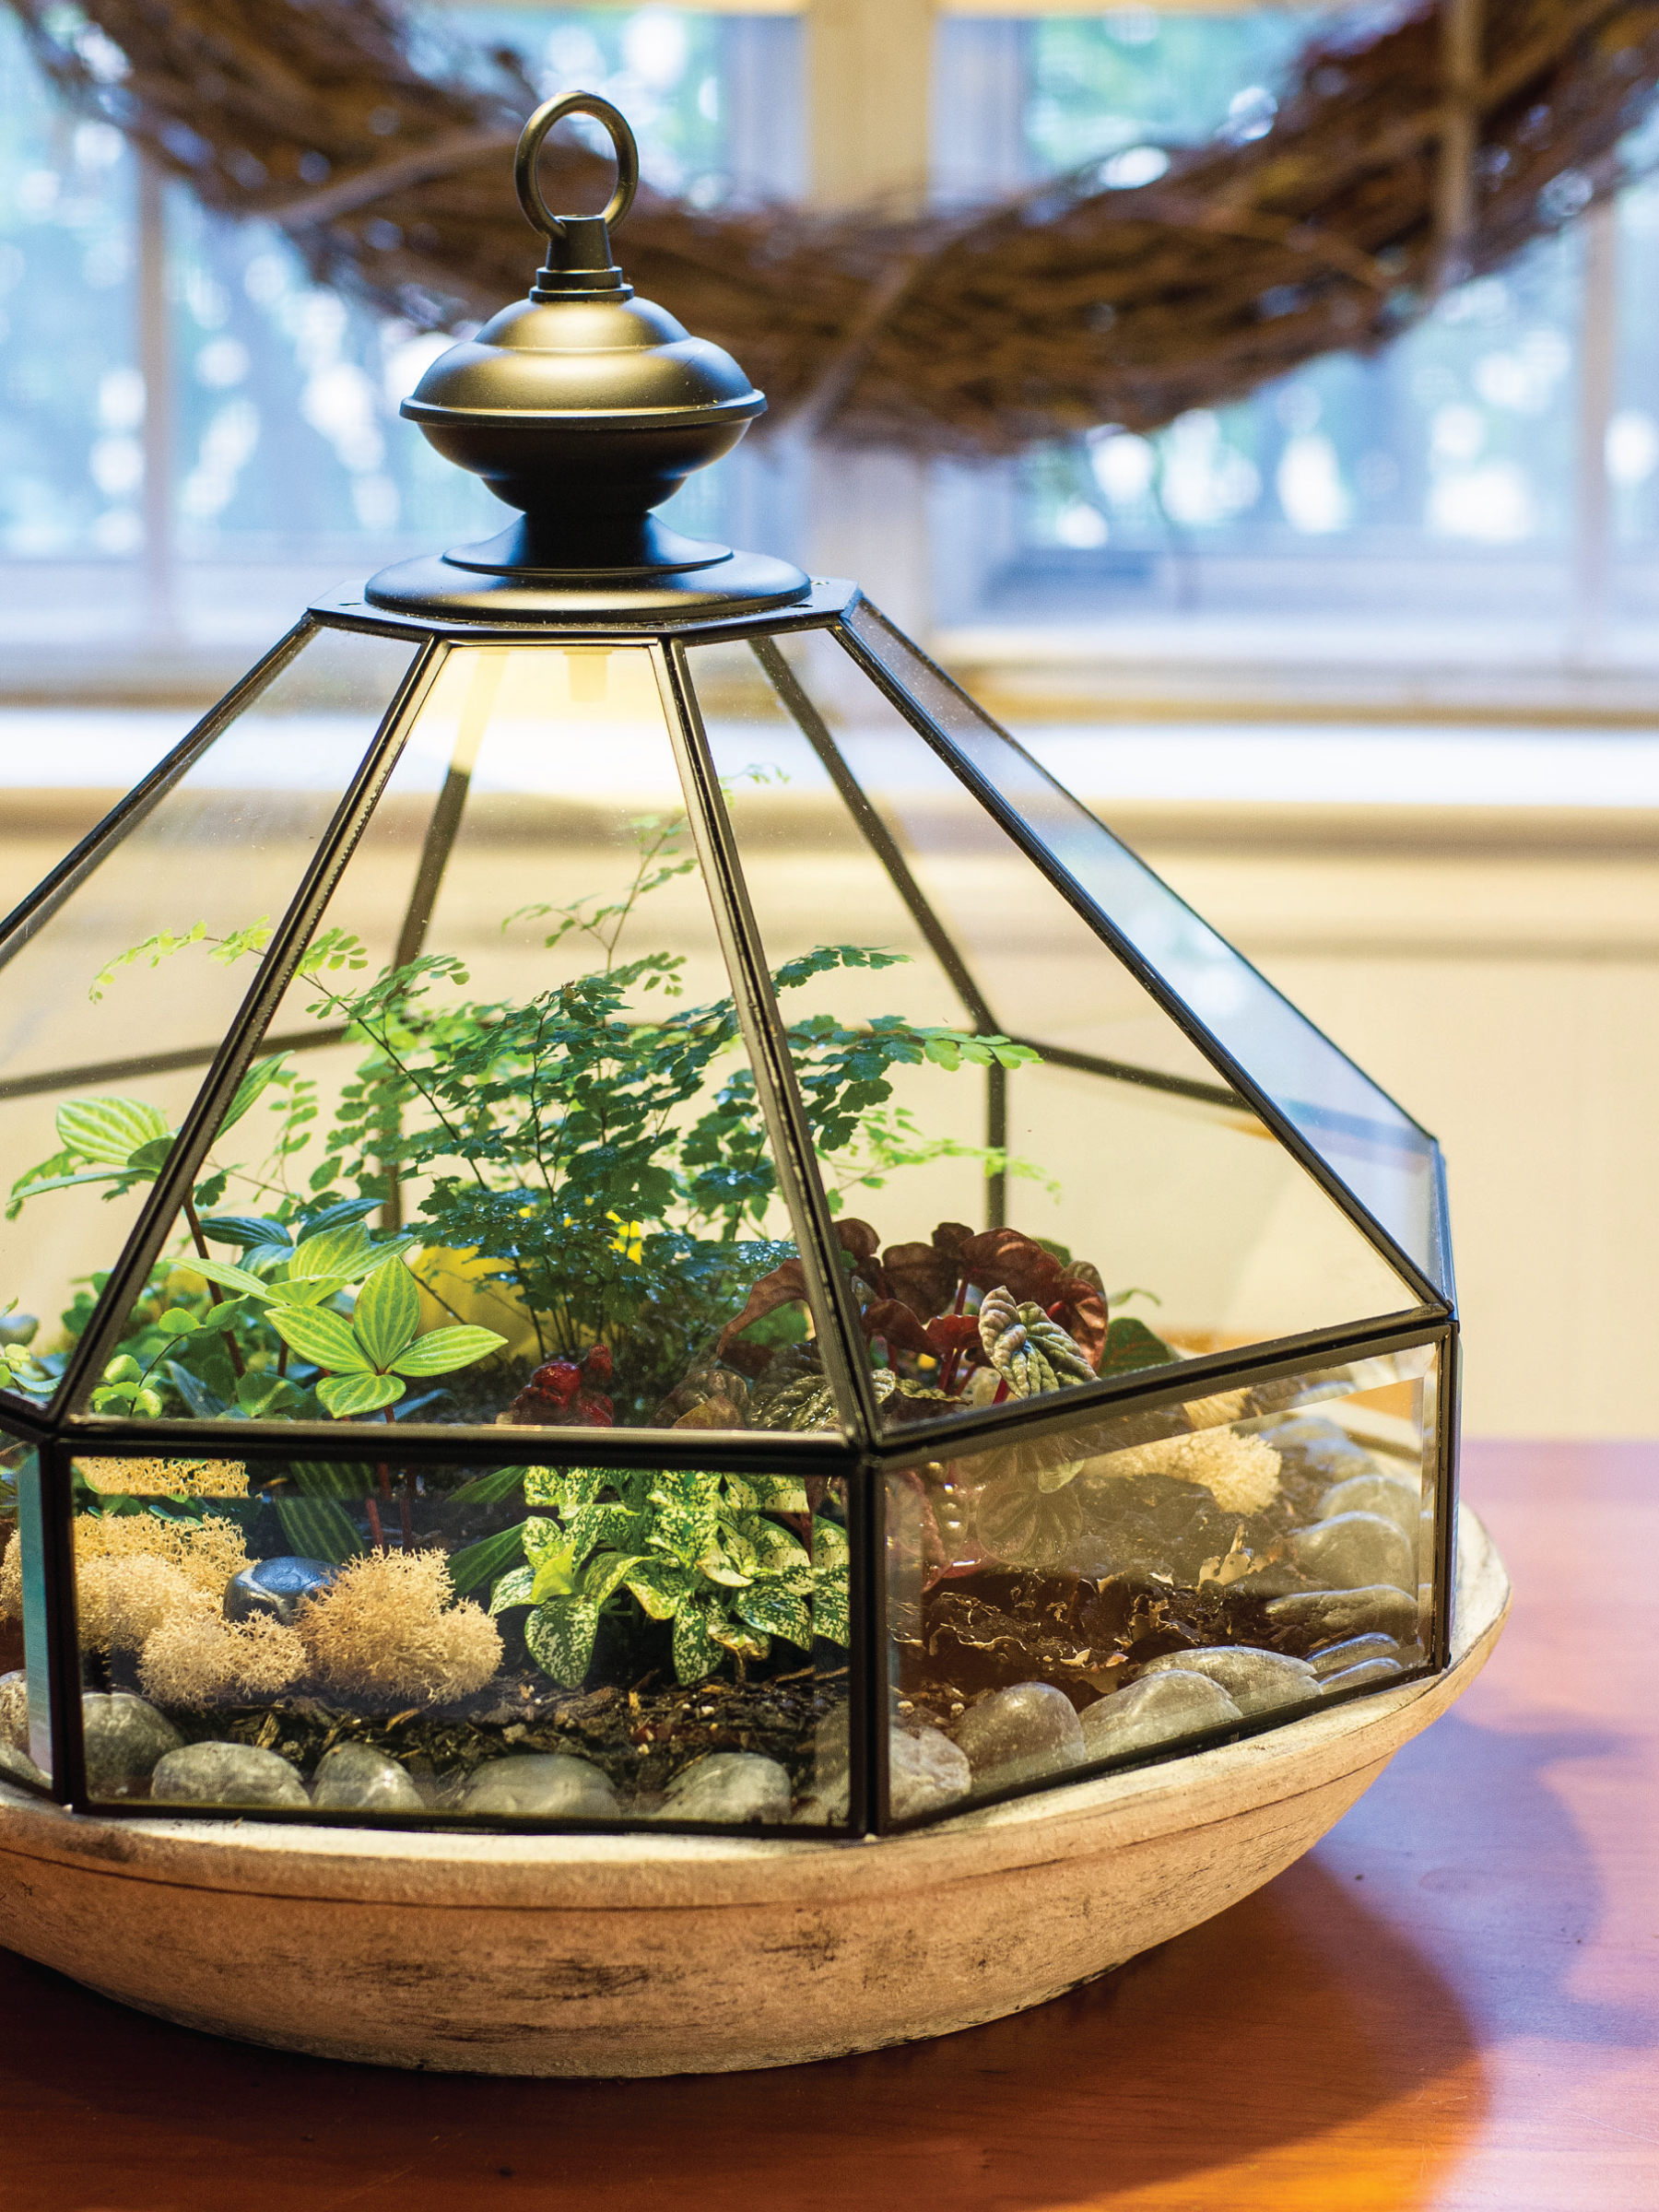 Upcycled Light Fixture Terrarium by Sam Henderson of Today's Nest for HGTVGardens.